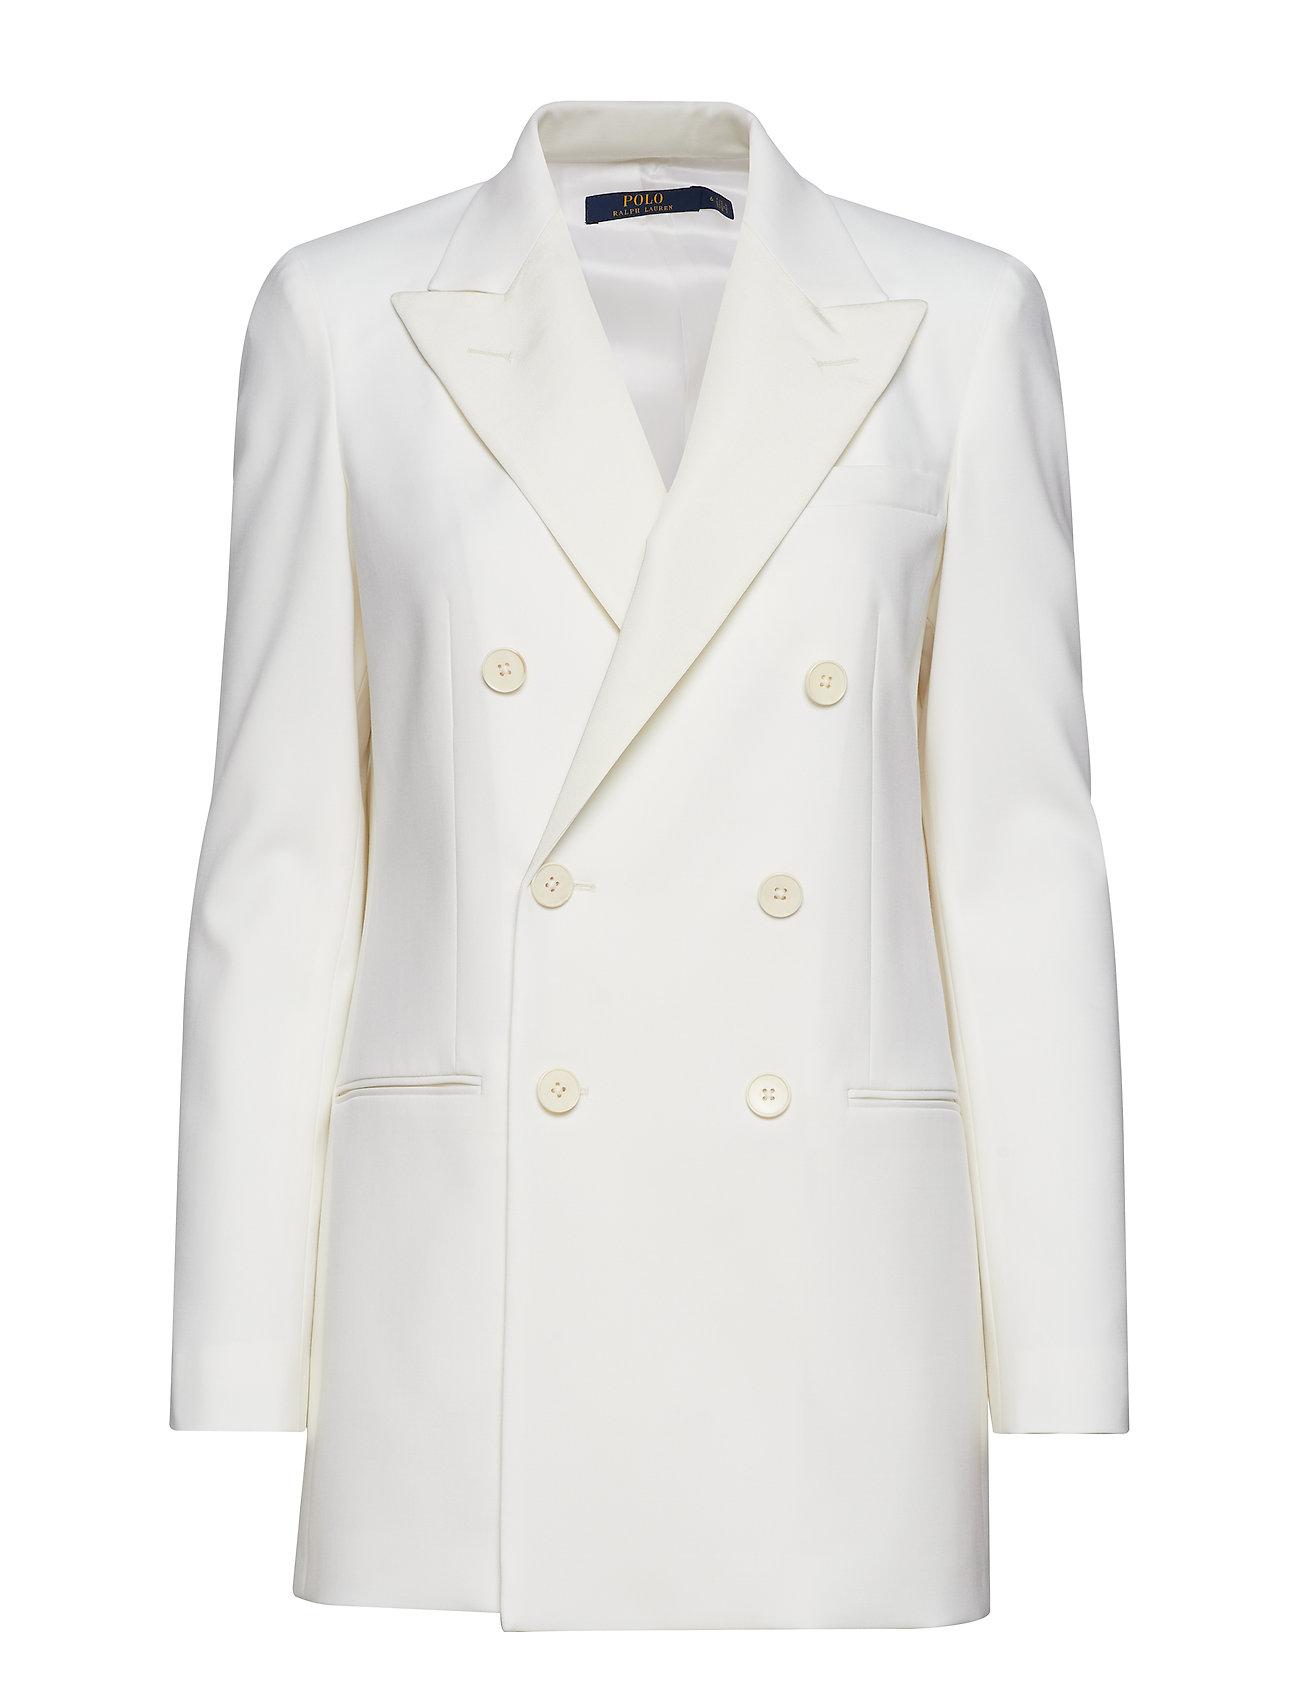 Polo Ralph Lauren Wool Tuxedo Blazer